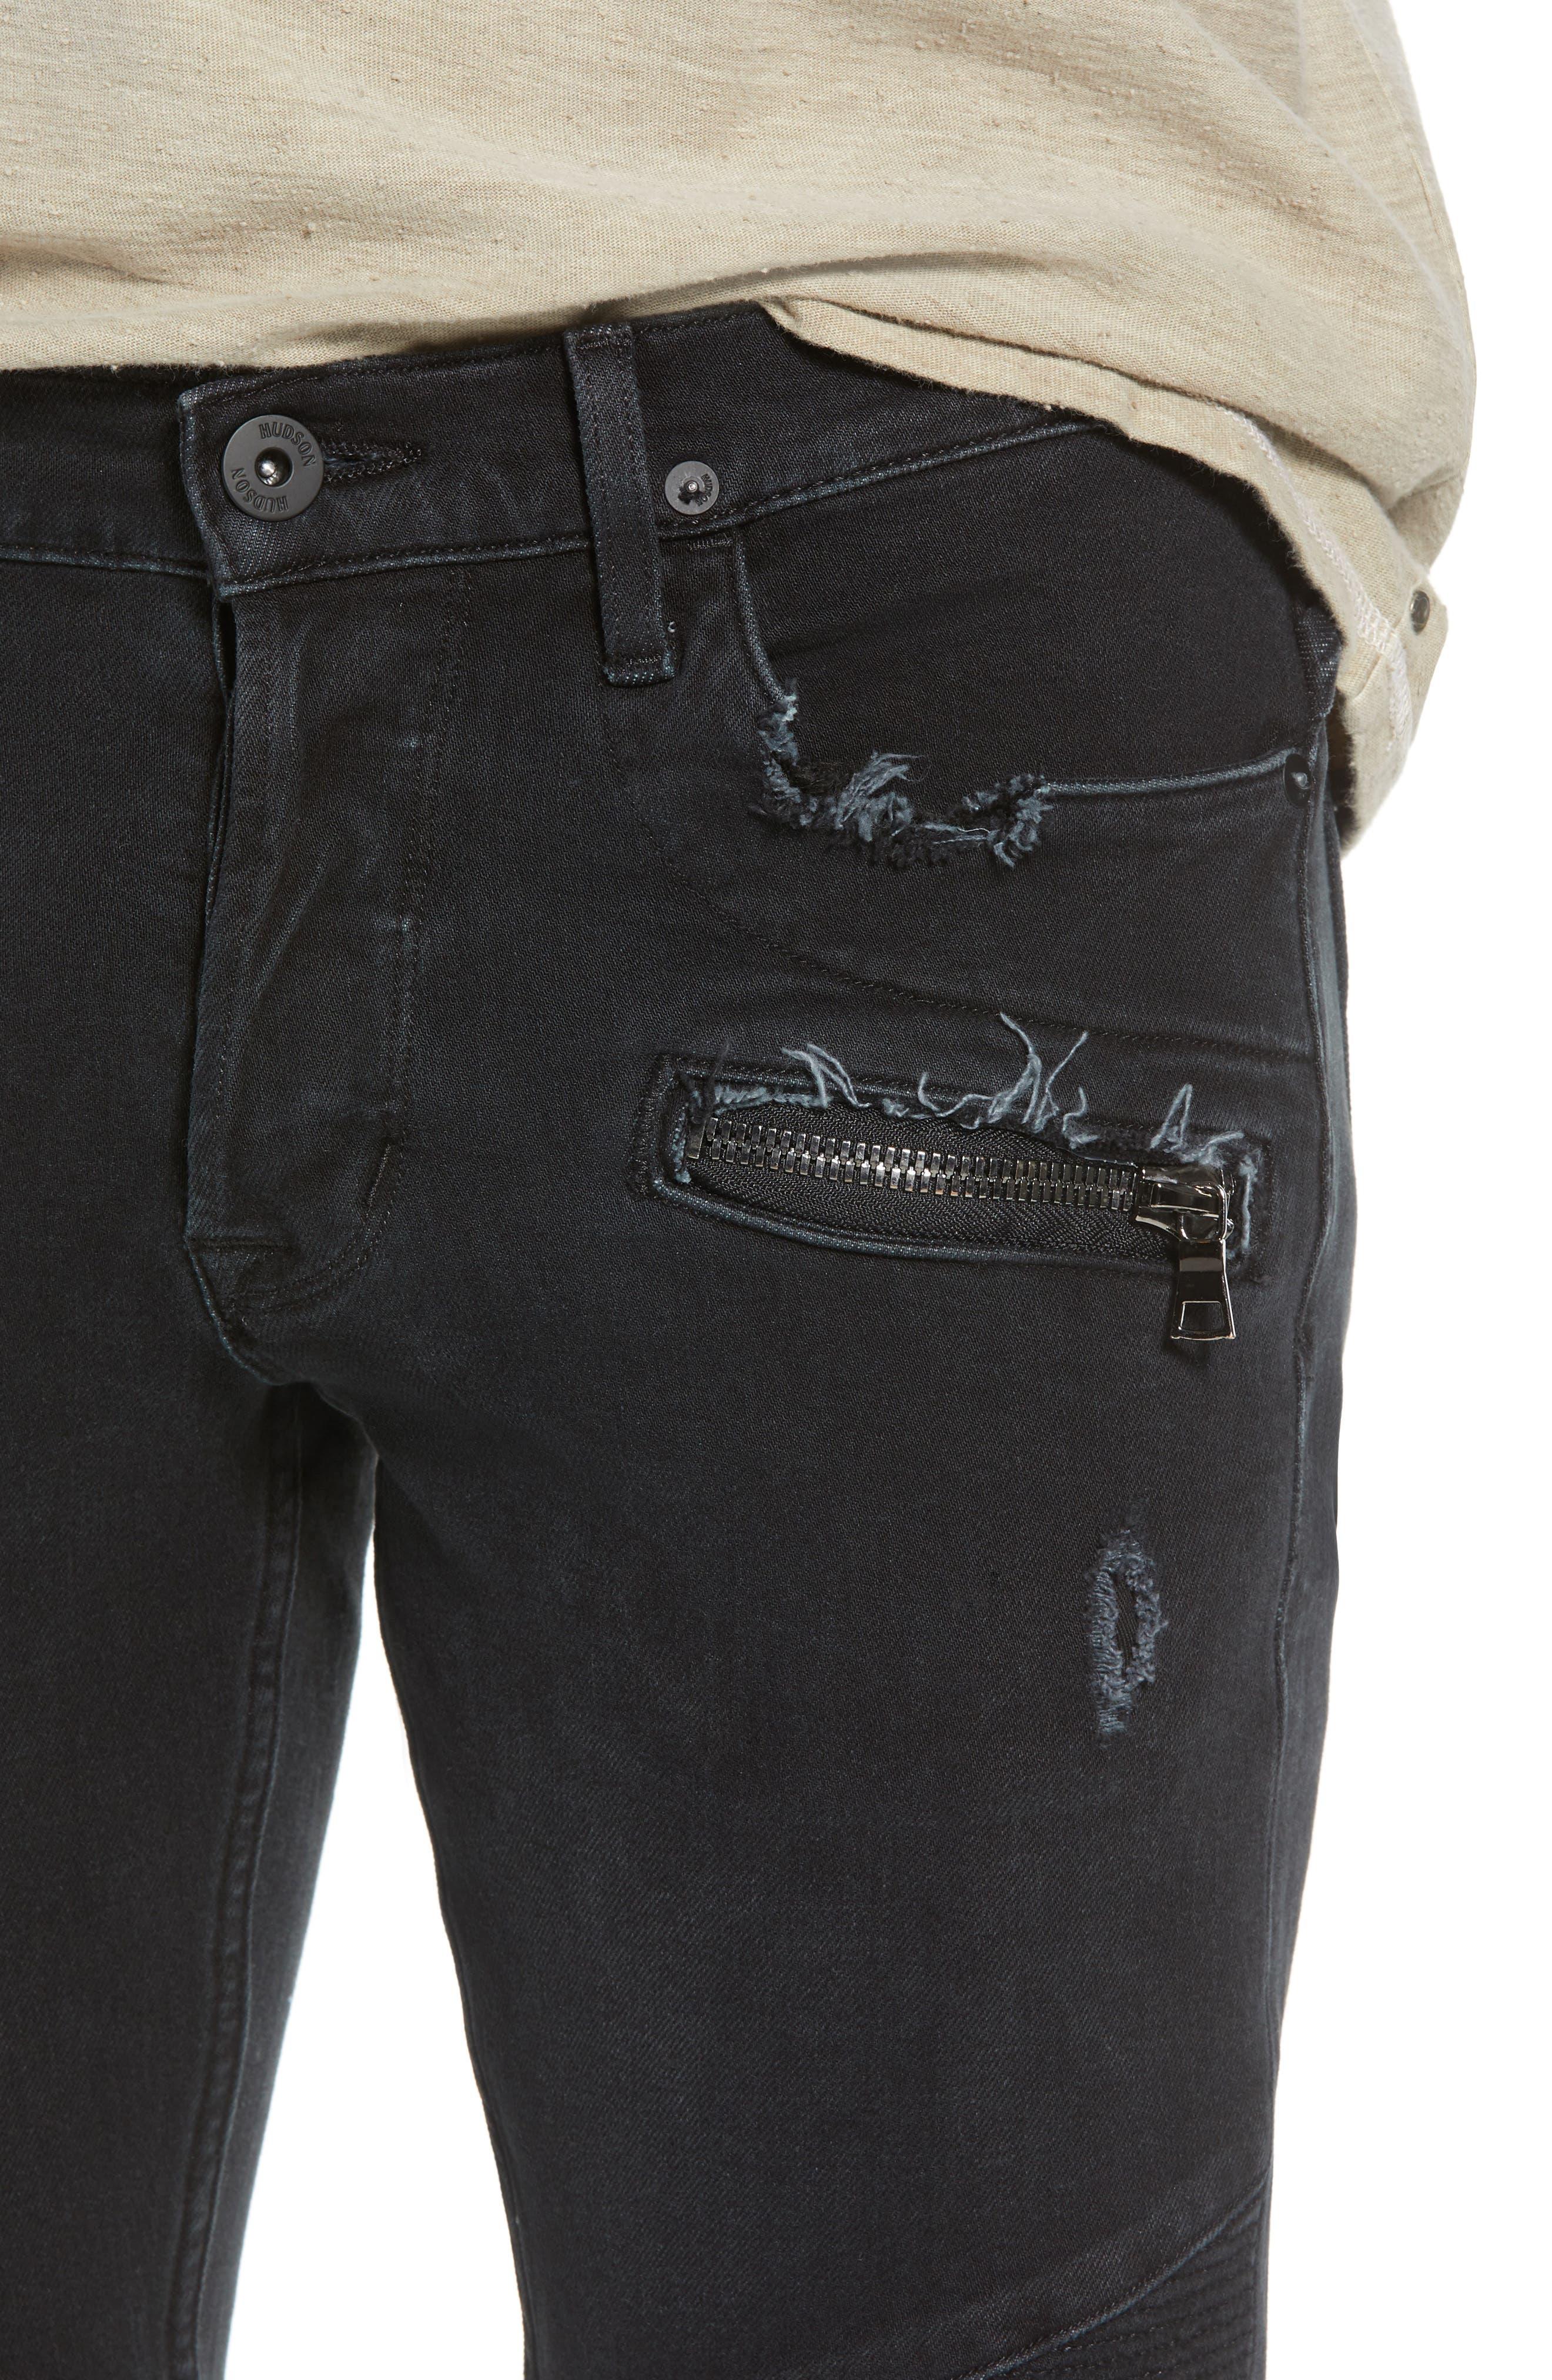 Blinder Biker Cutoff Shorts,                             Alternate thumbnail 4, color,                             Fade Away